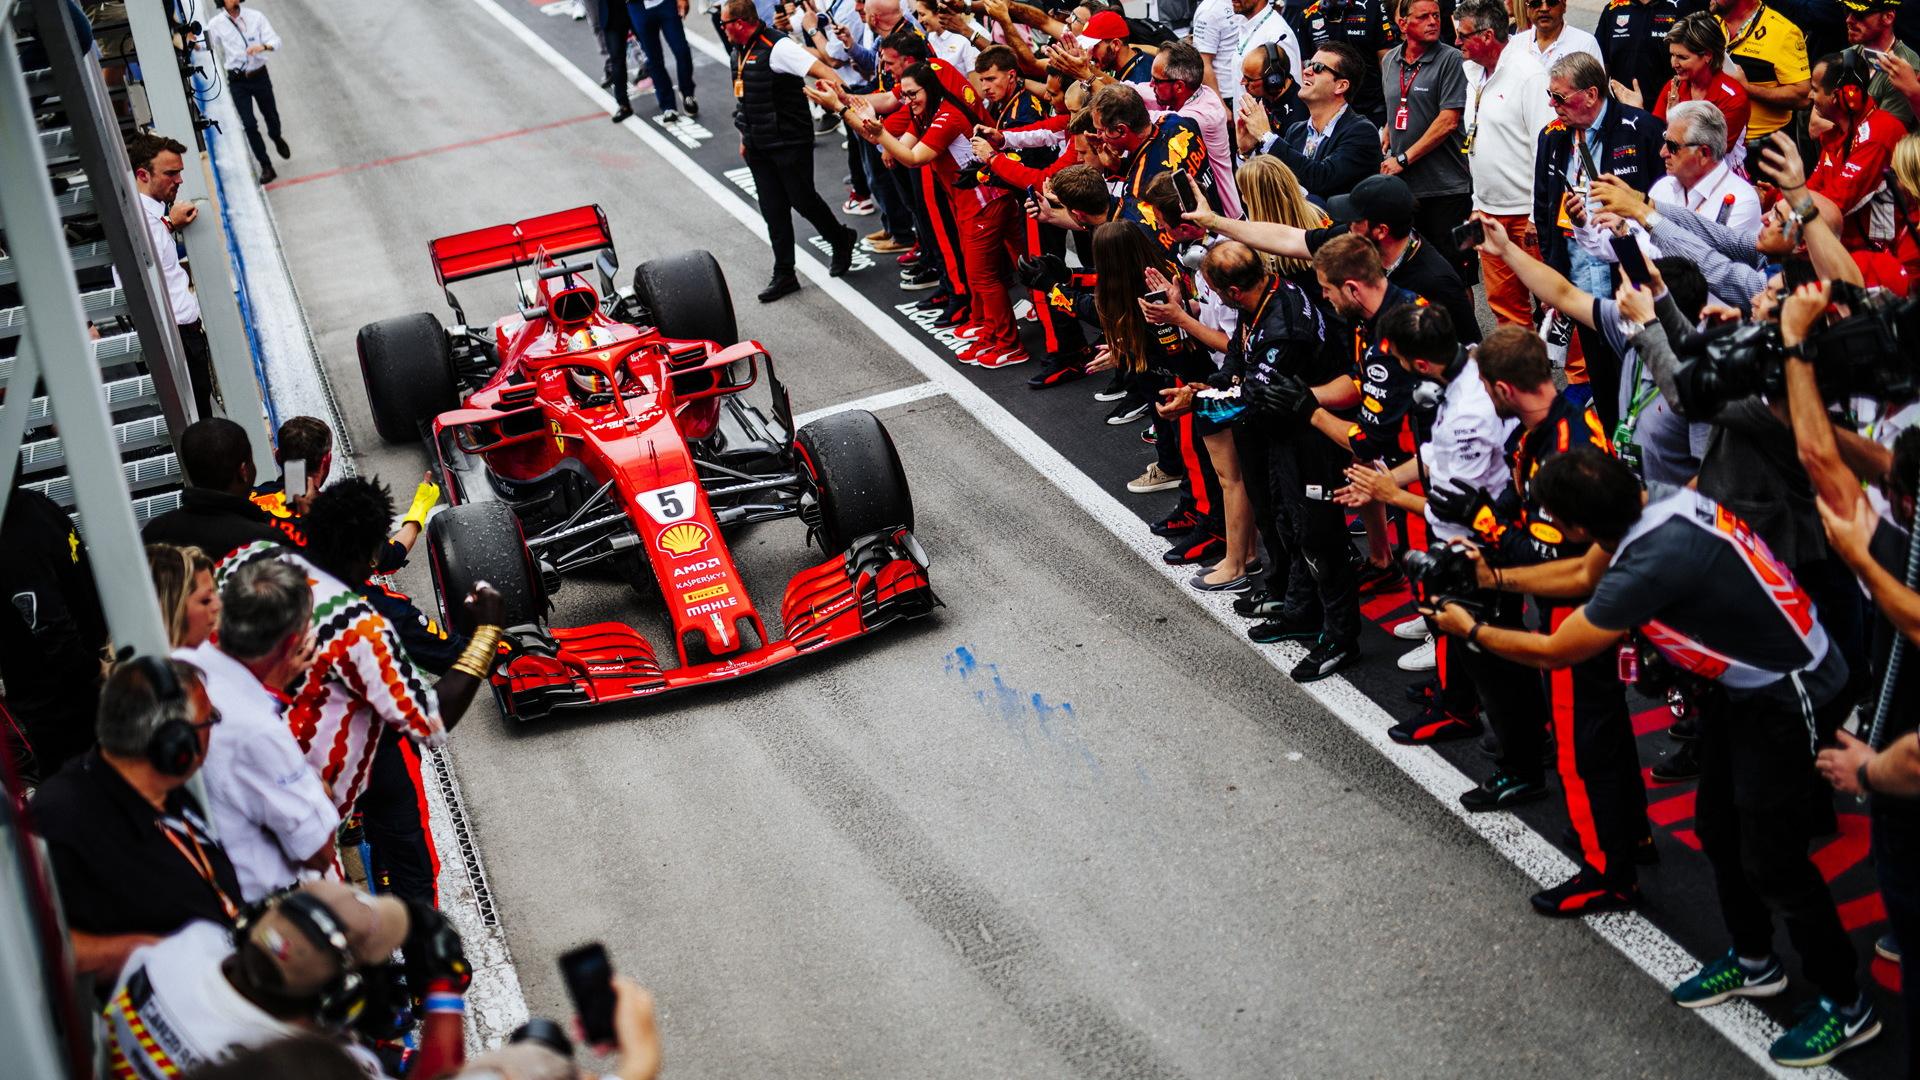 Ferrari at the 2018 Formula 1 Canadian Grand Prix